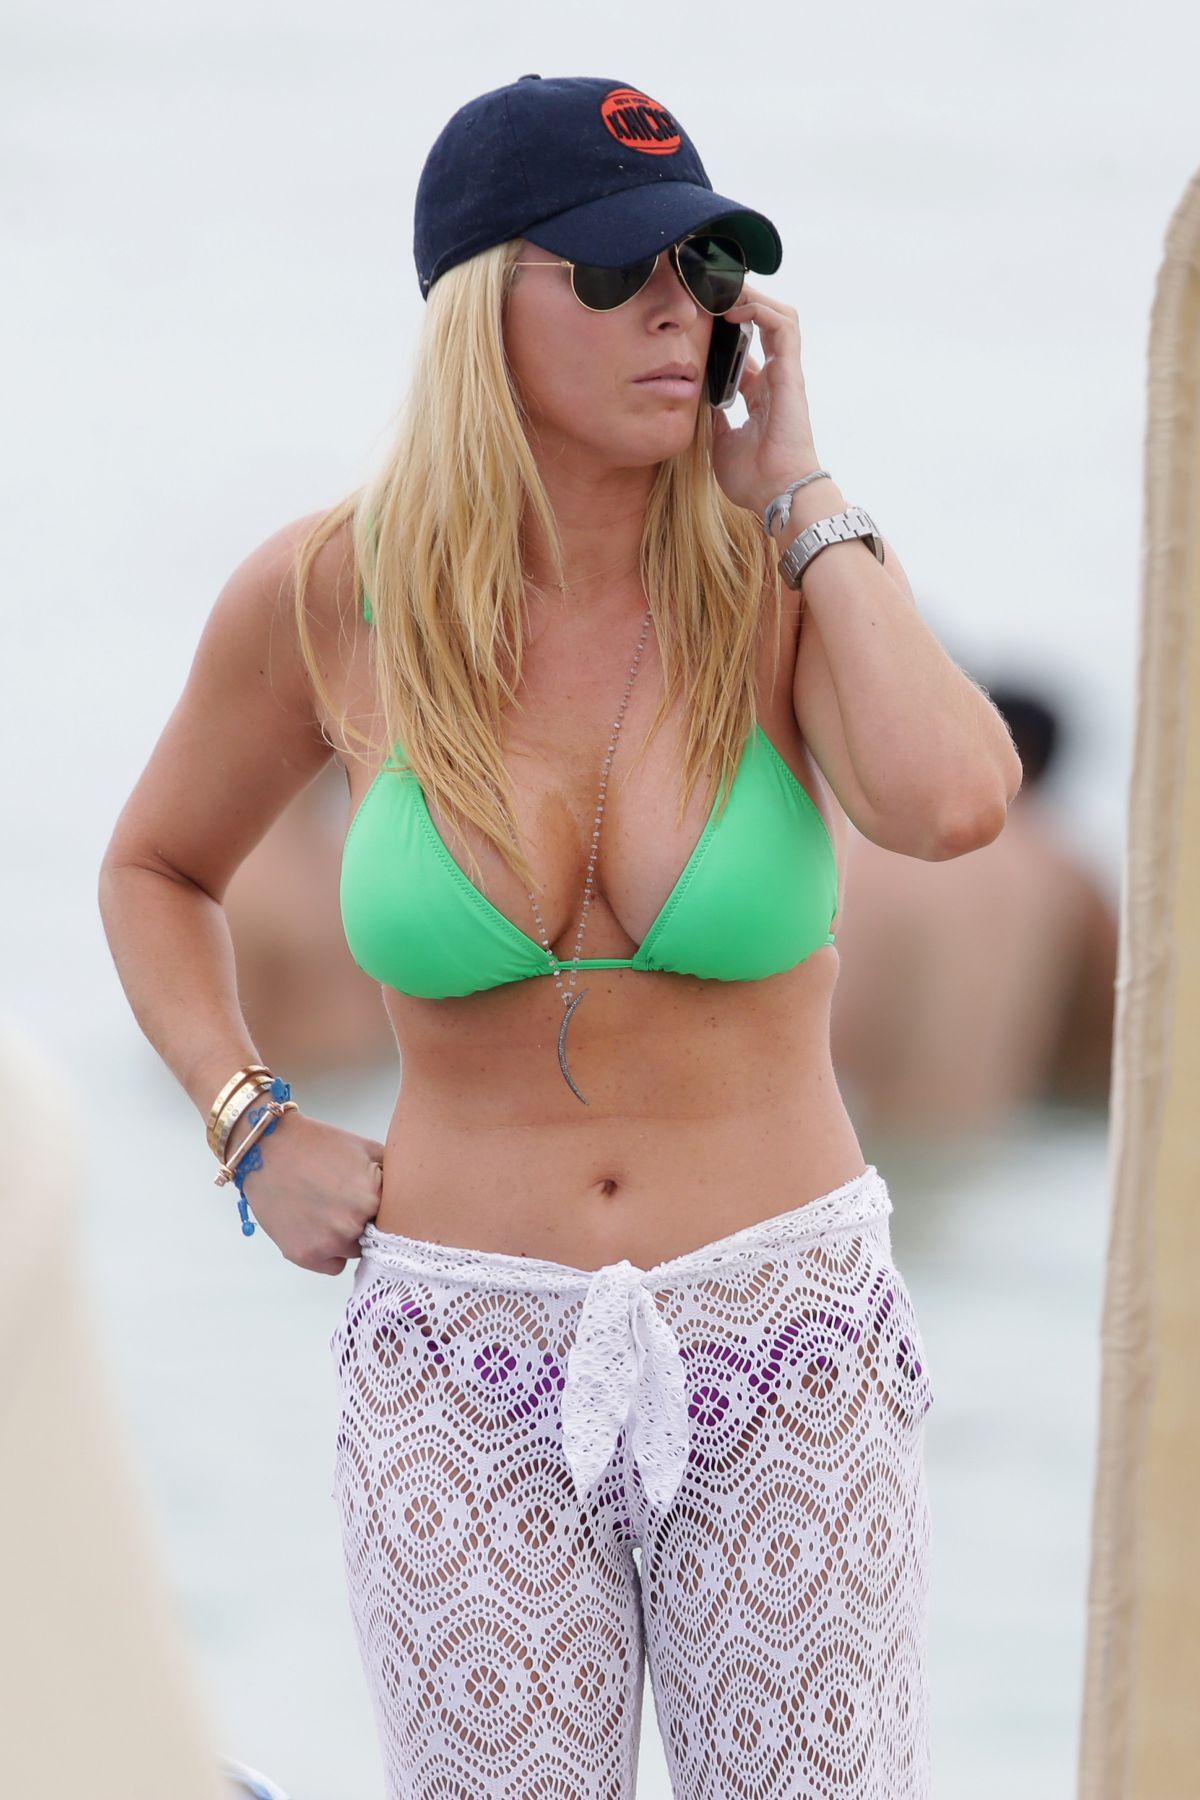 pictures Kellie martin bikini